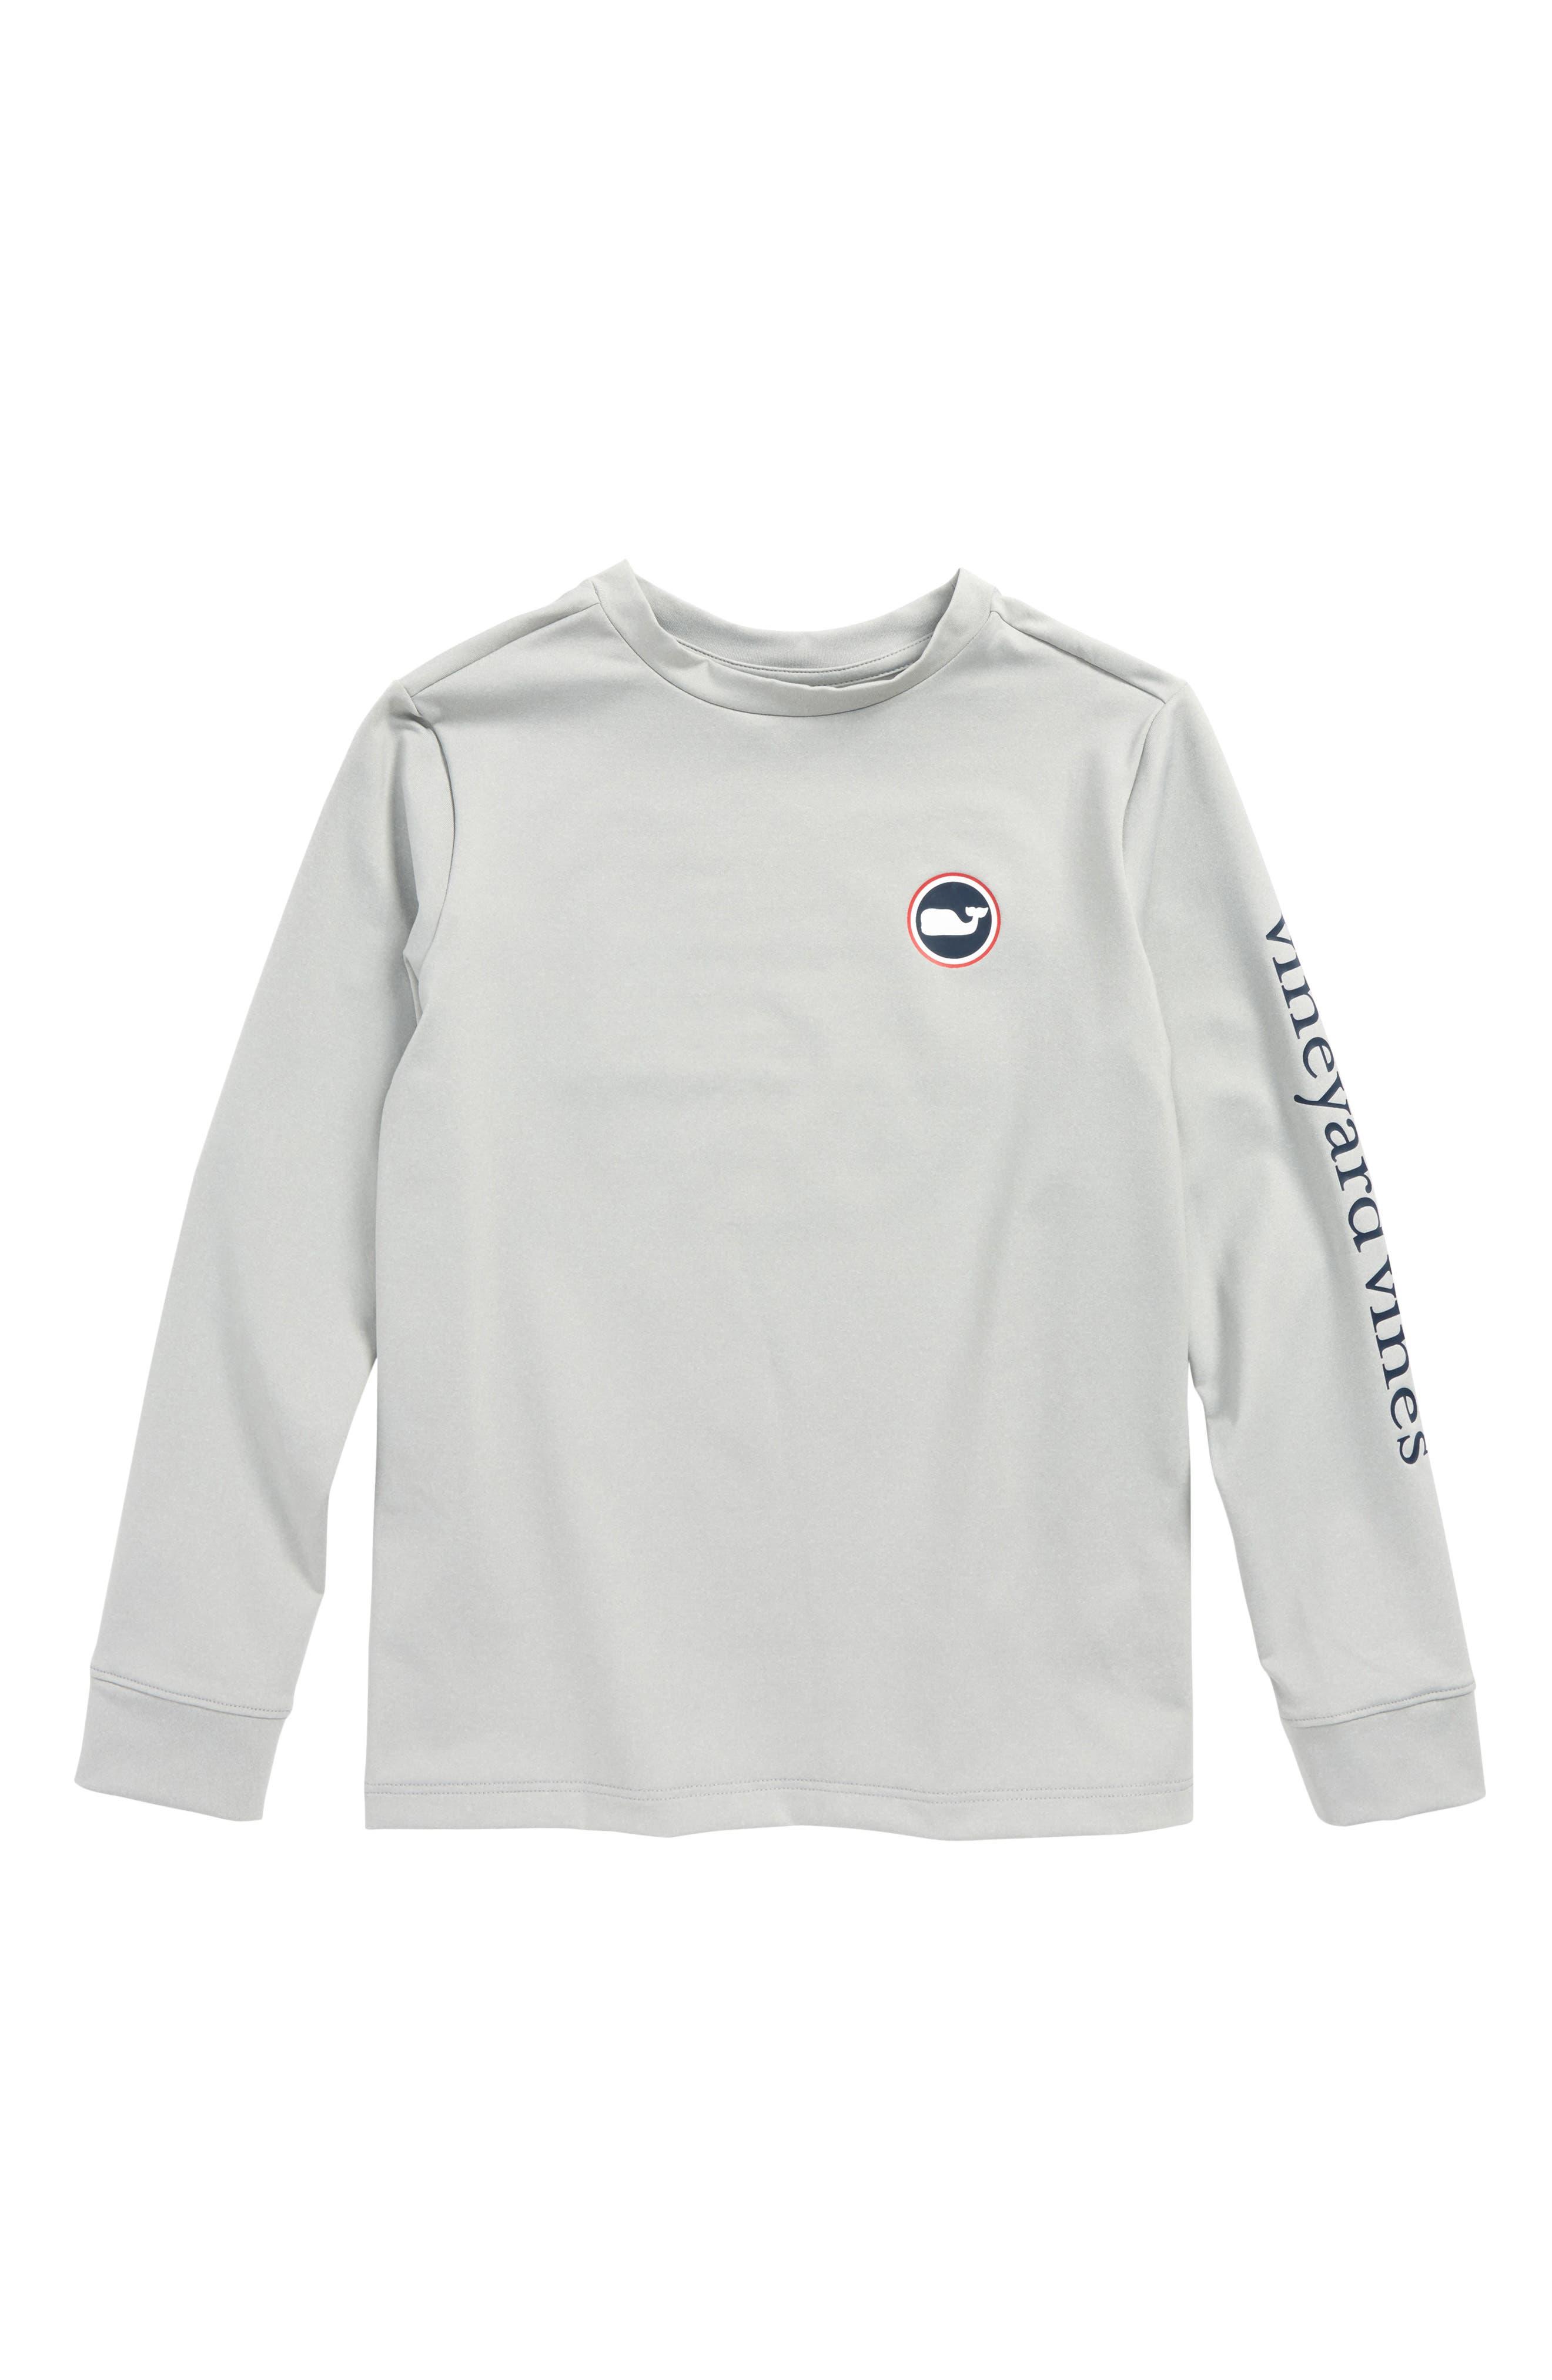 Whale Dot Performance T-Shirt,                             Main thumbnail 1, color,                             Gray Heather